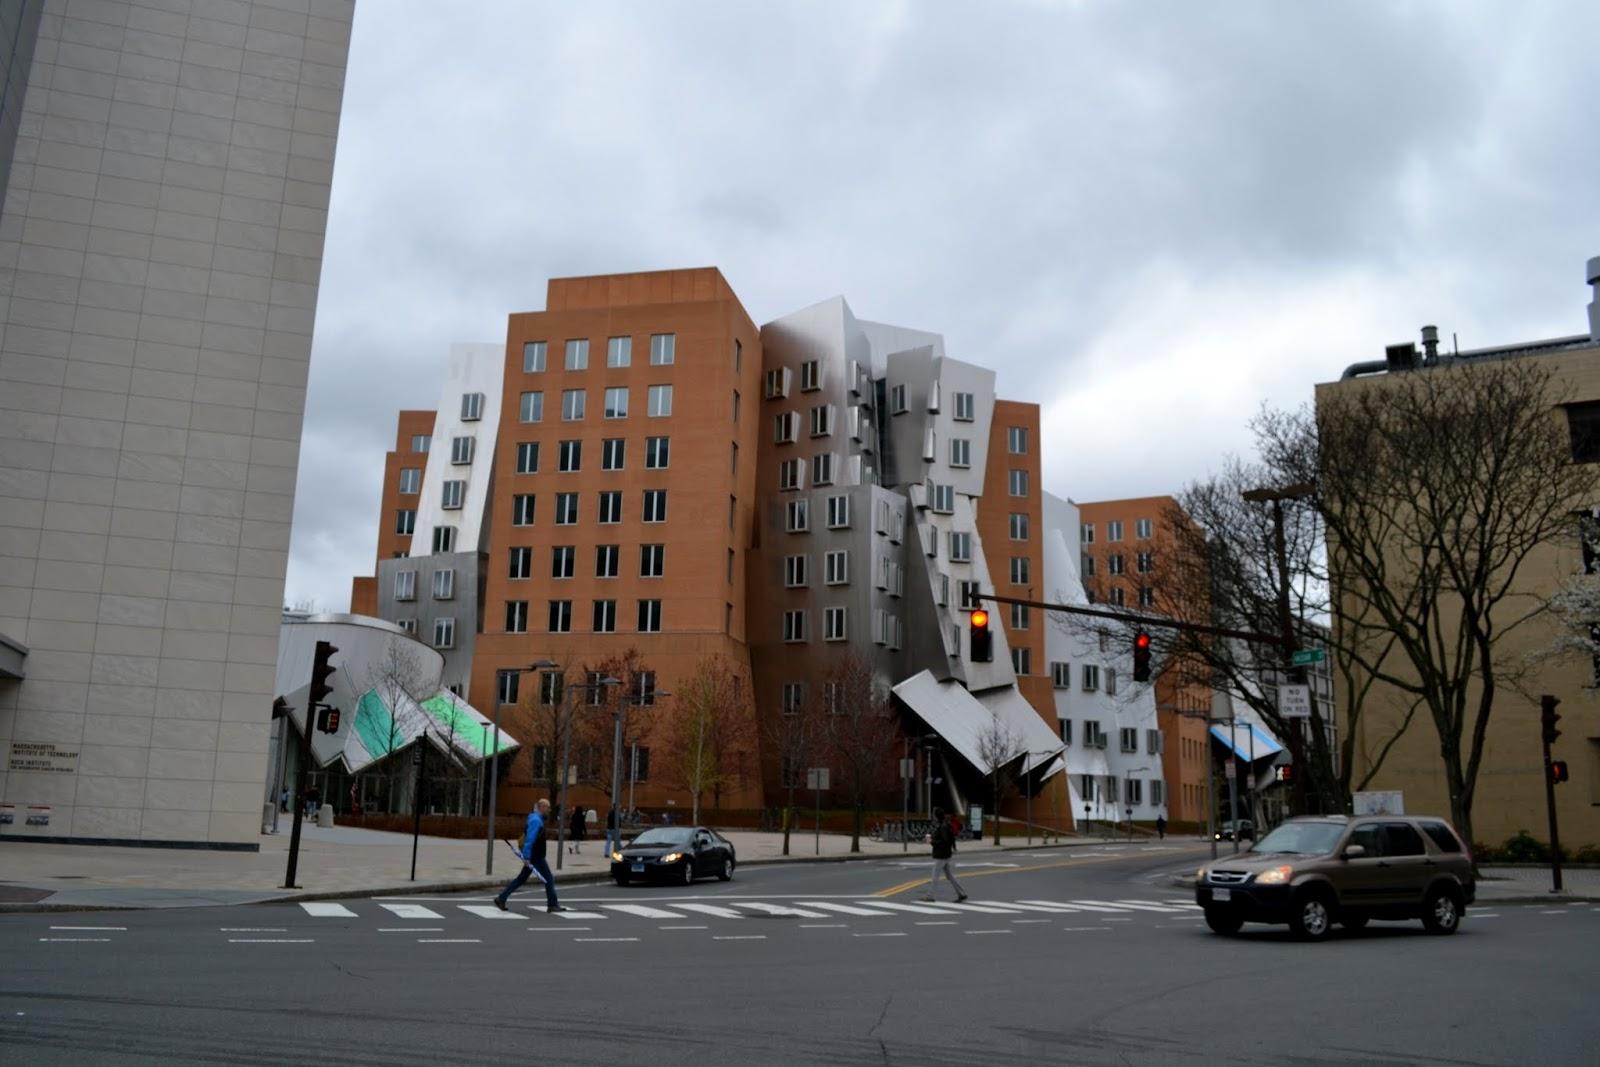 Центр Рея и Марии Стата, Бостон, Массачусетс (Ray and Maria Stata Center, Boston, MA)